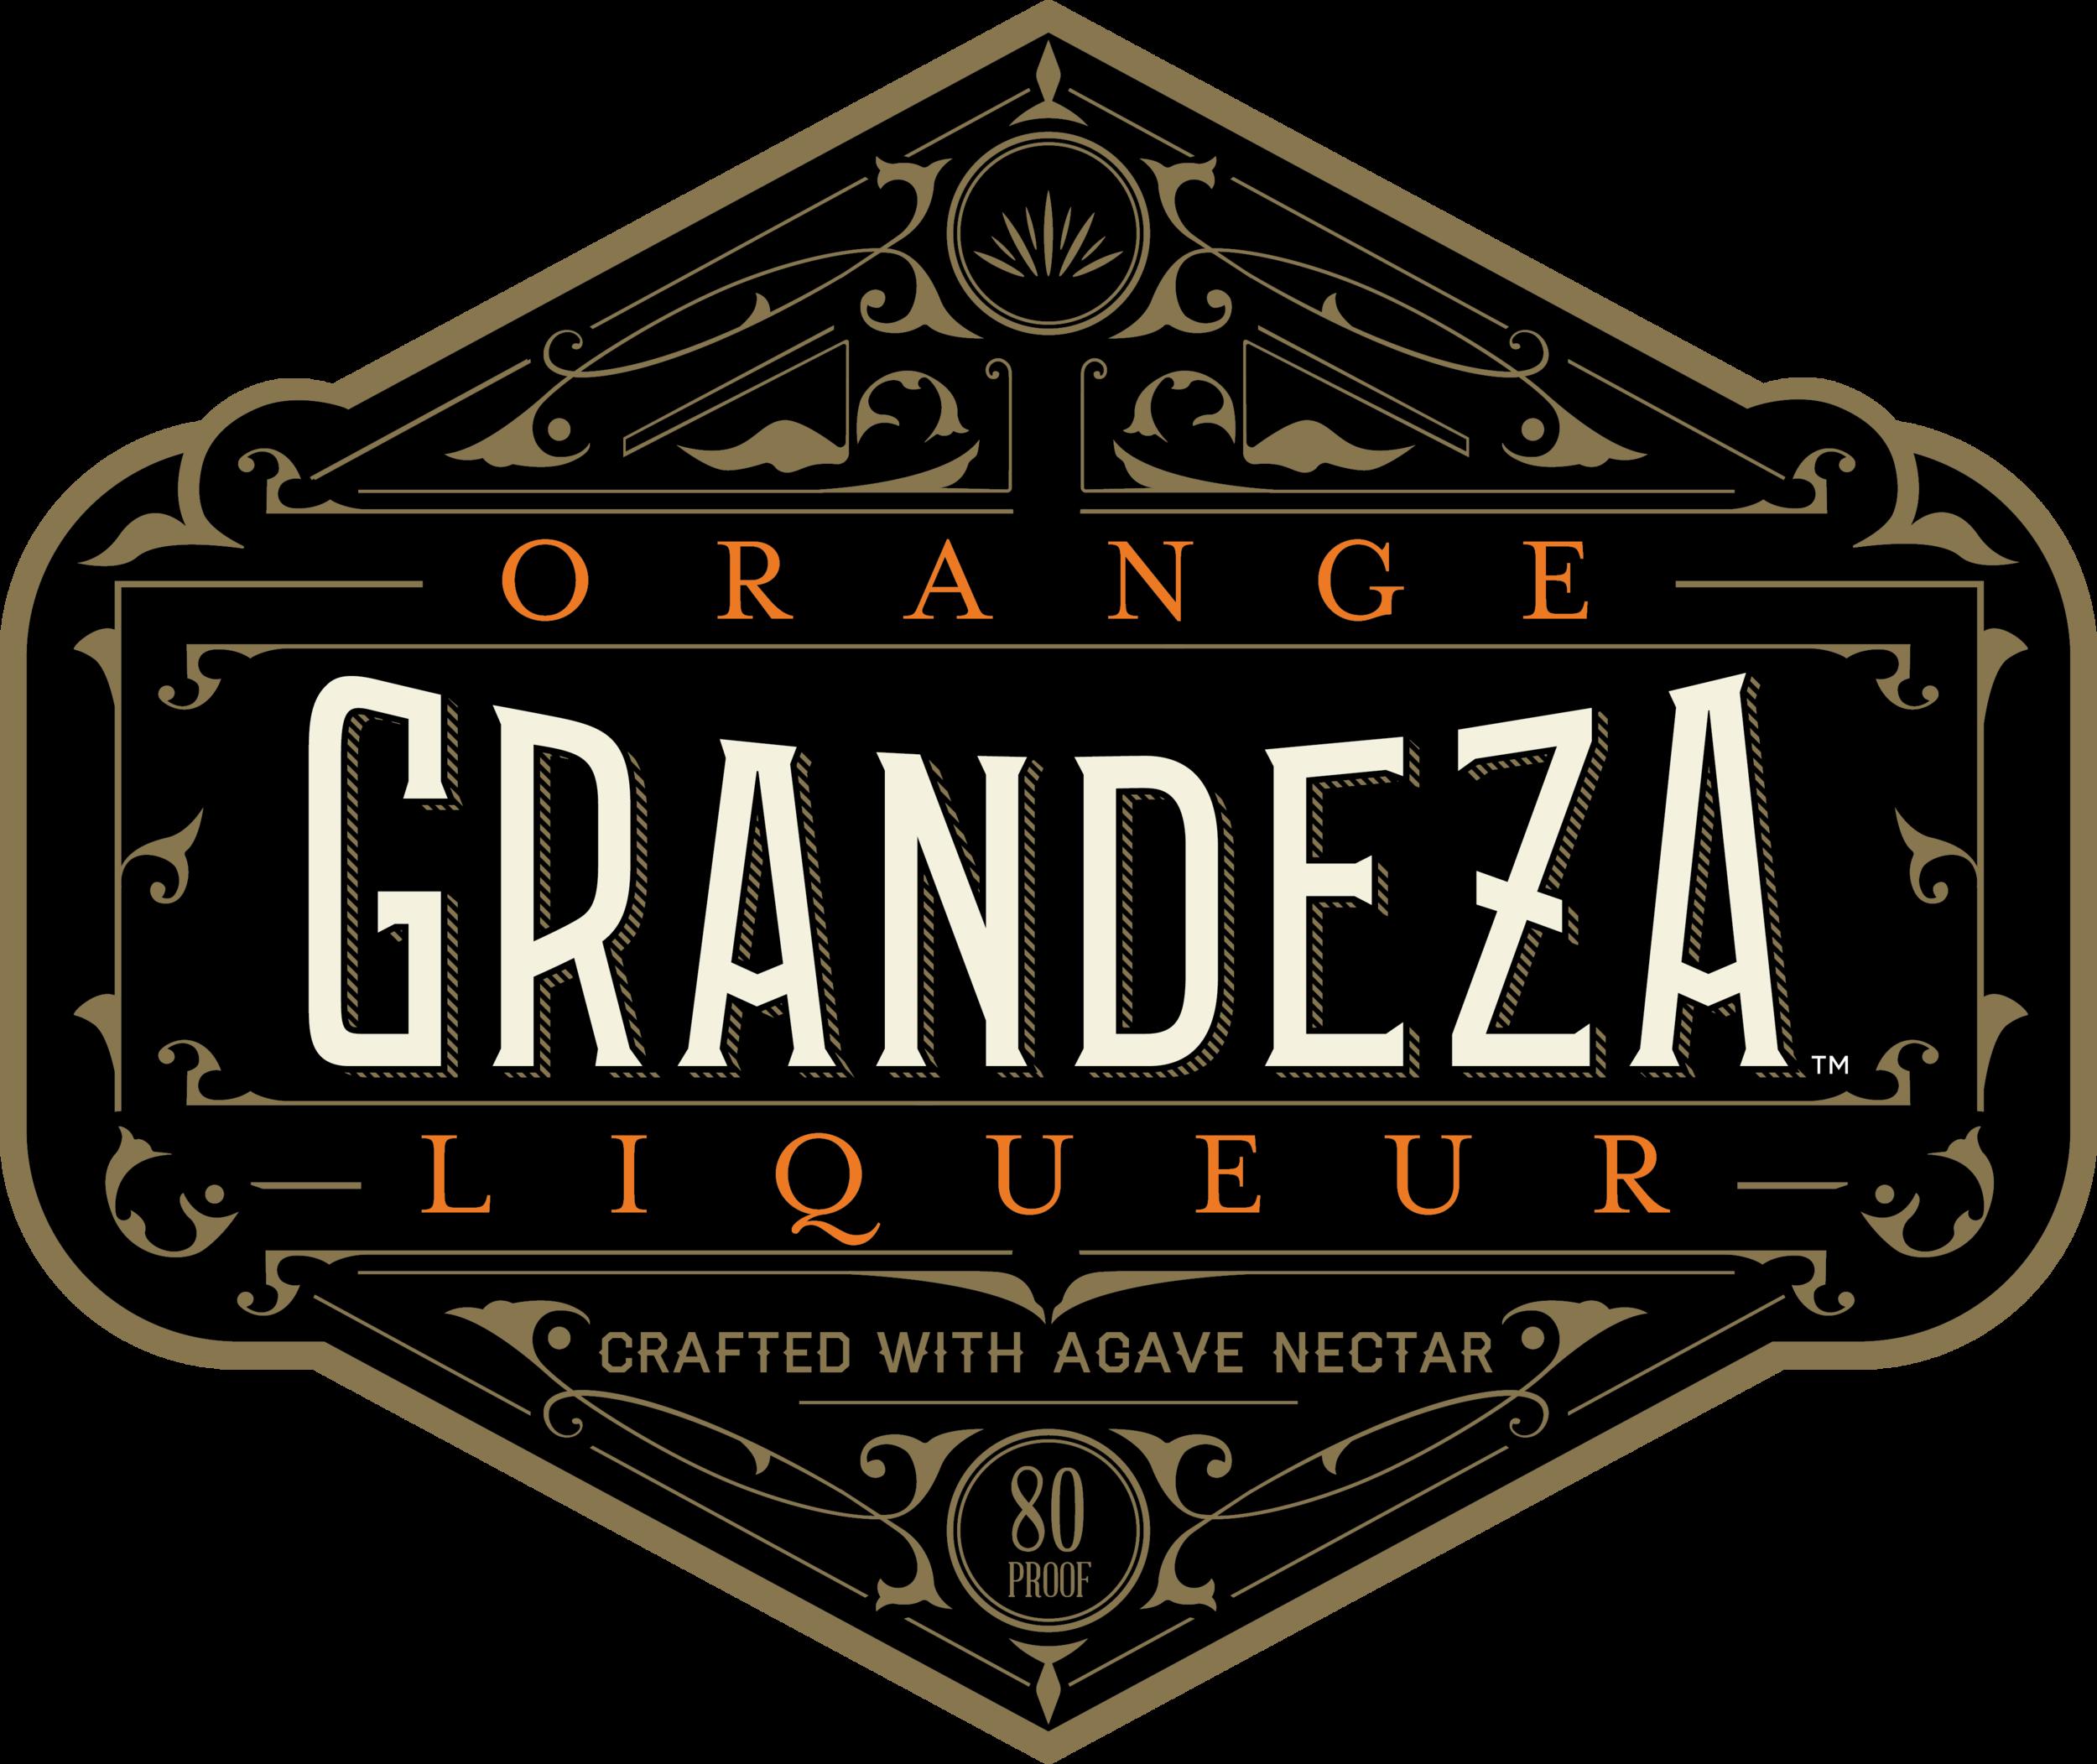 Grandeza for swag Black - Orange Letters.png